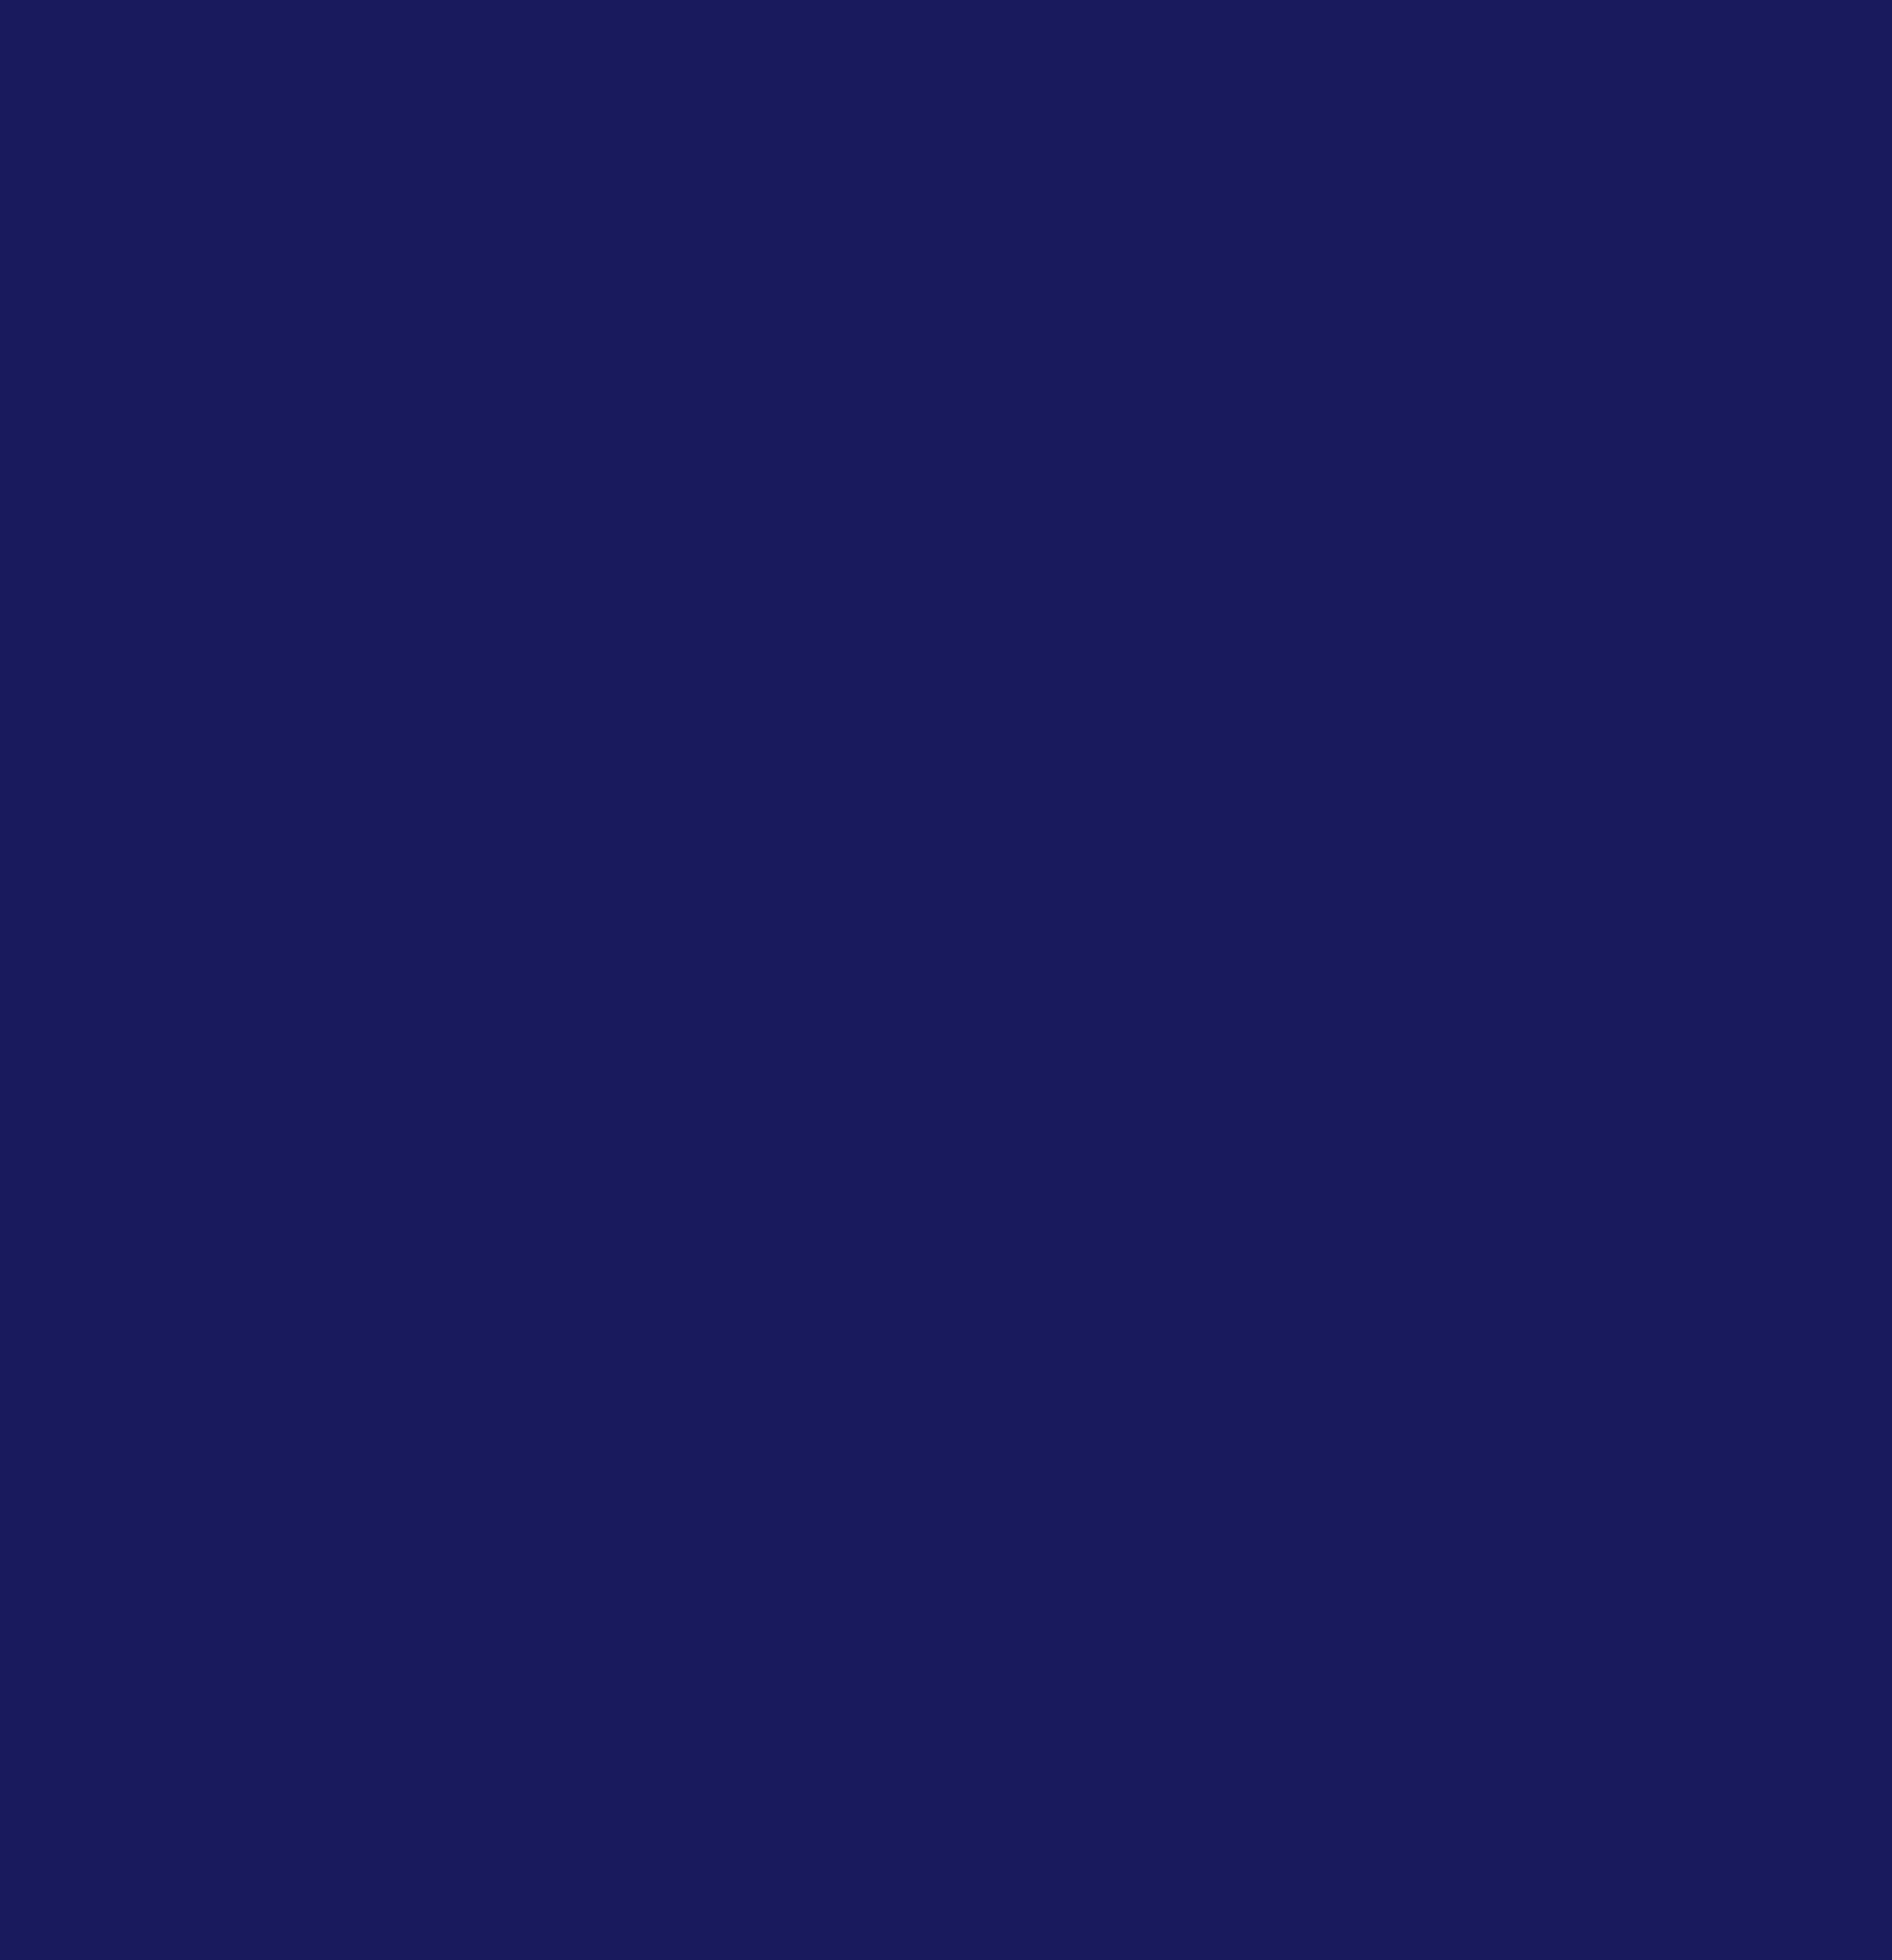 optics_twoslit-001.png